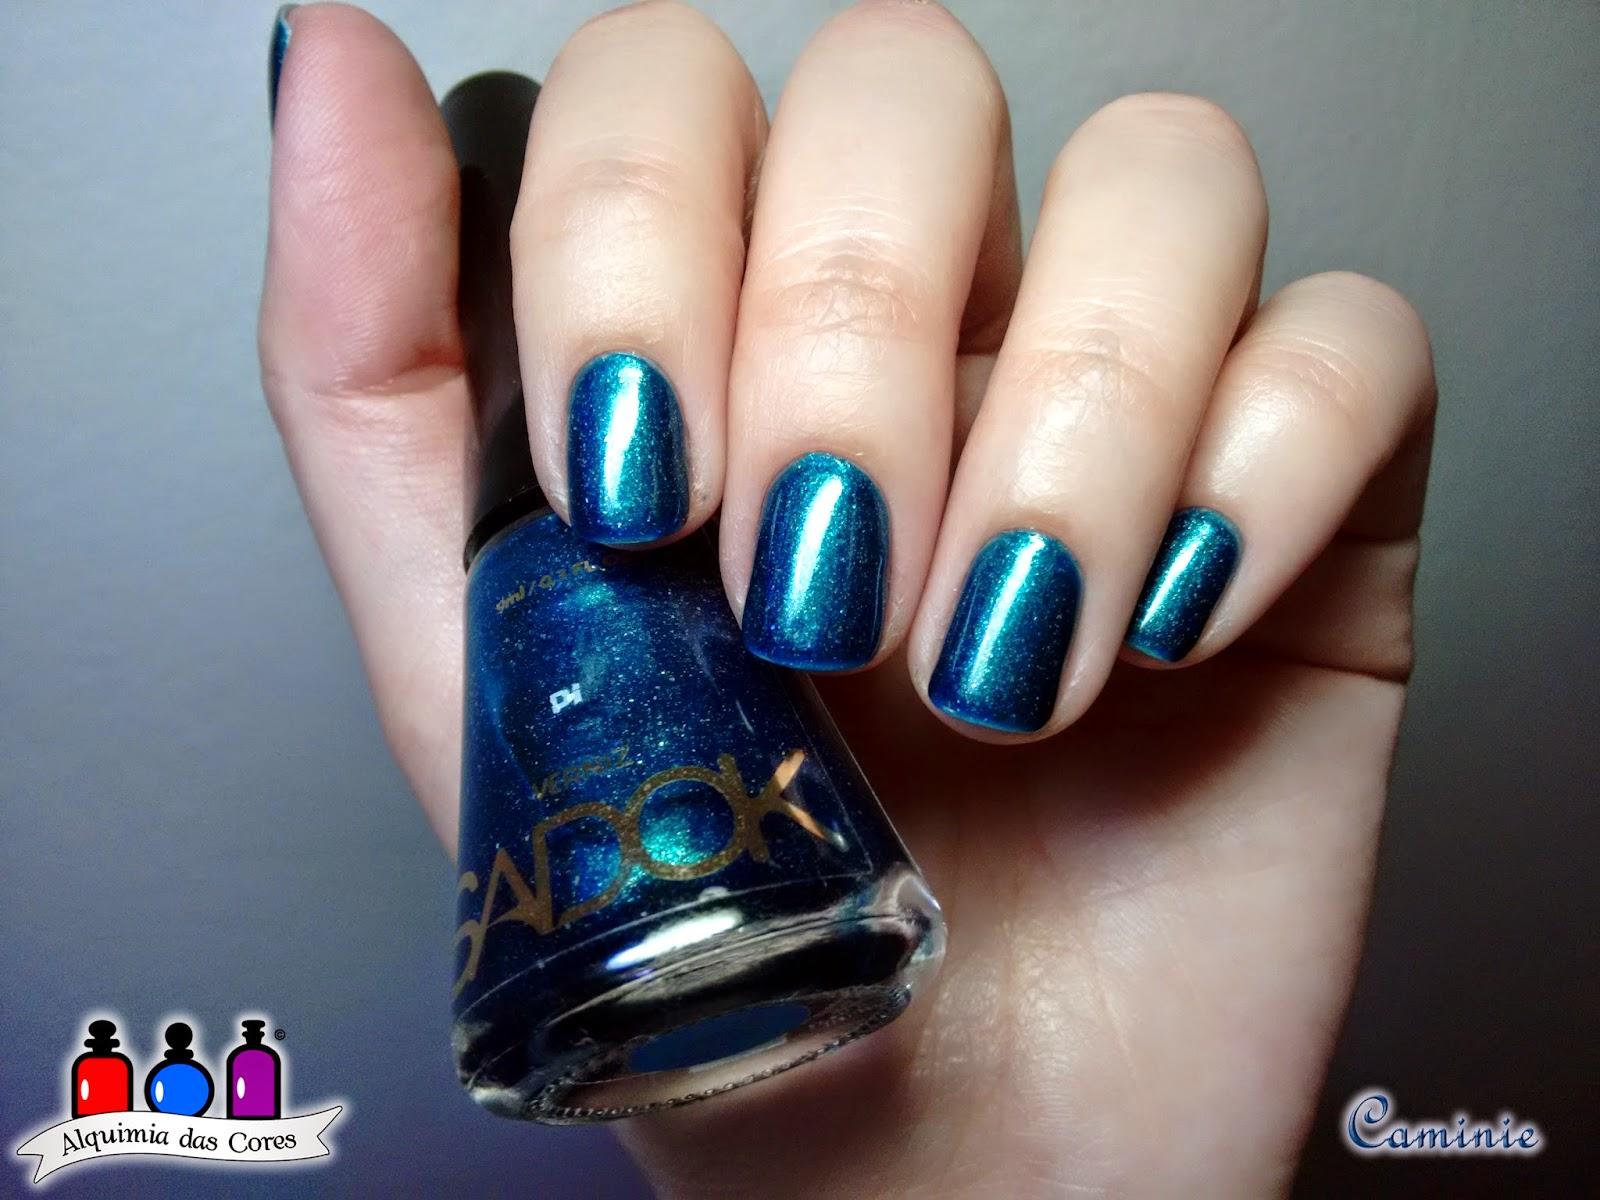 Sadok, Pi, duochrome, multichrome, verde, azul, petróleo, esmalte, nail polish, caminie